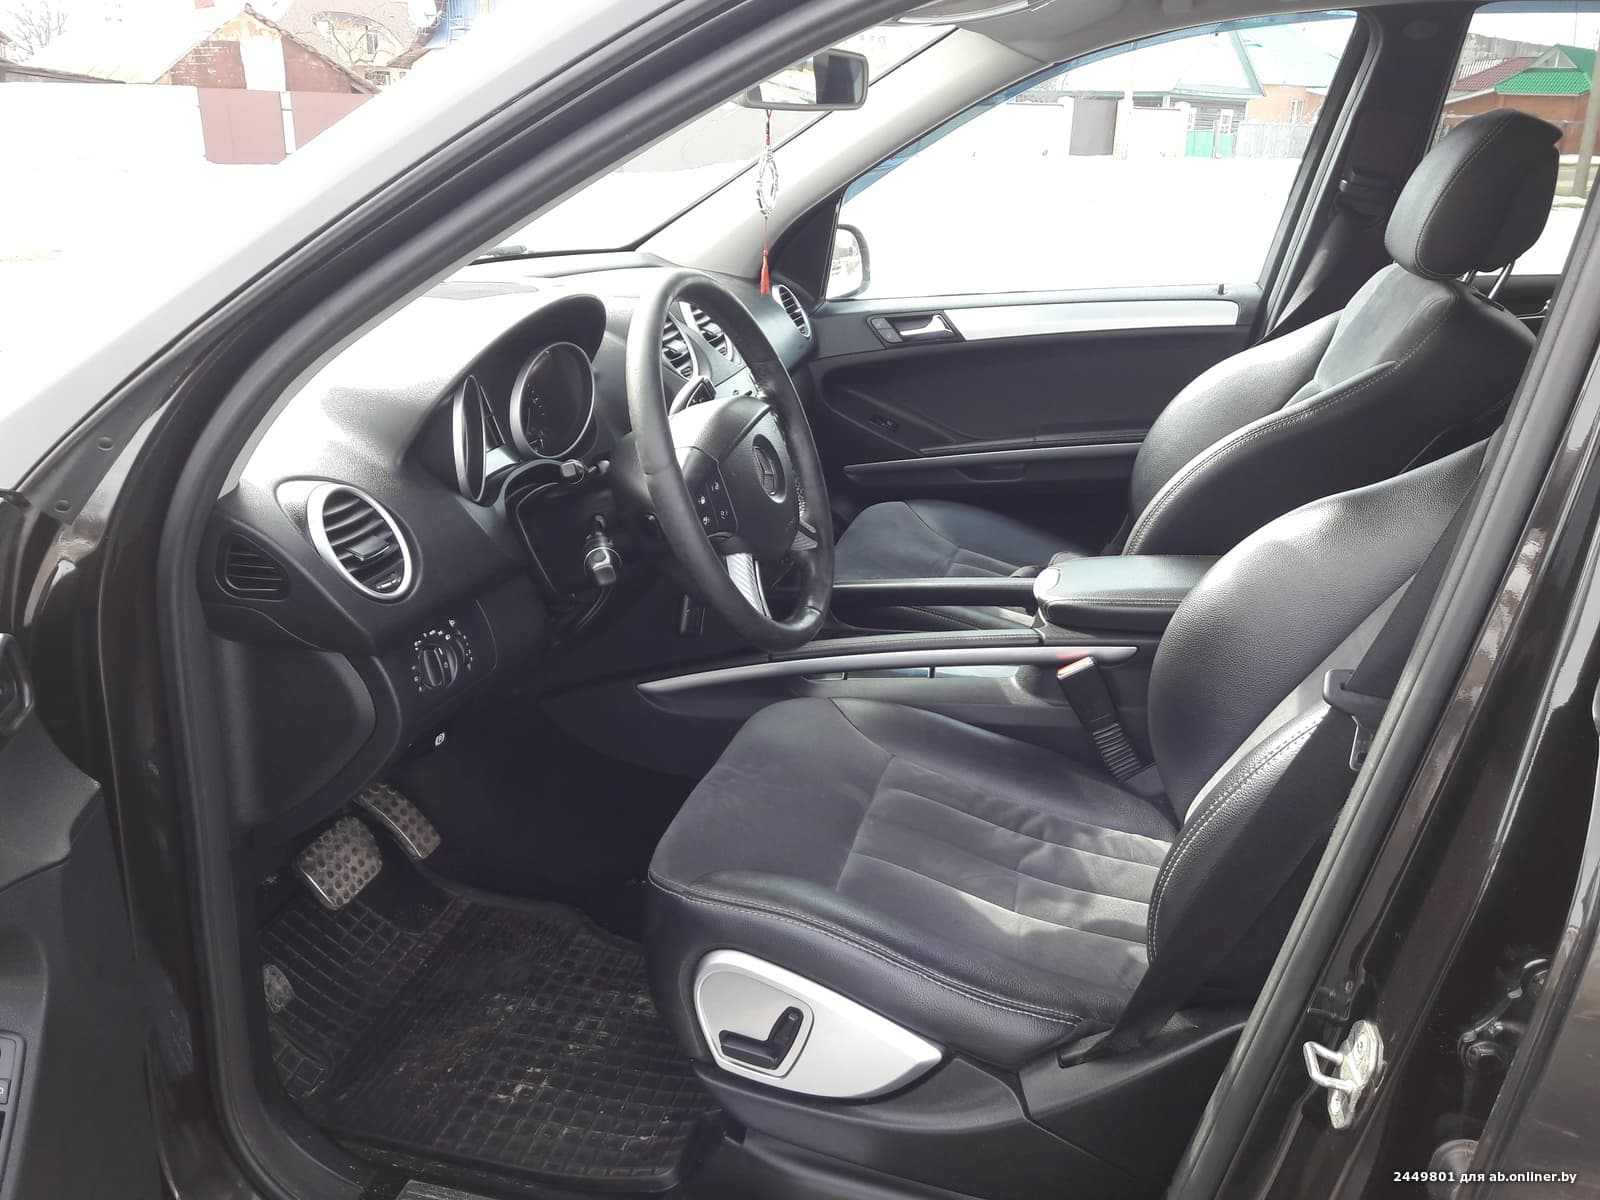 Mercedes ML320 CDI